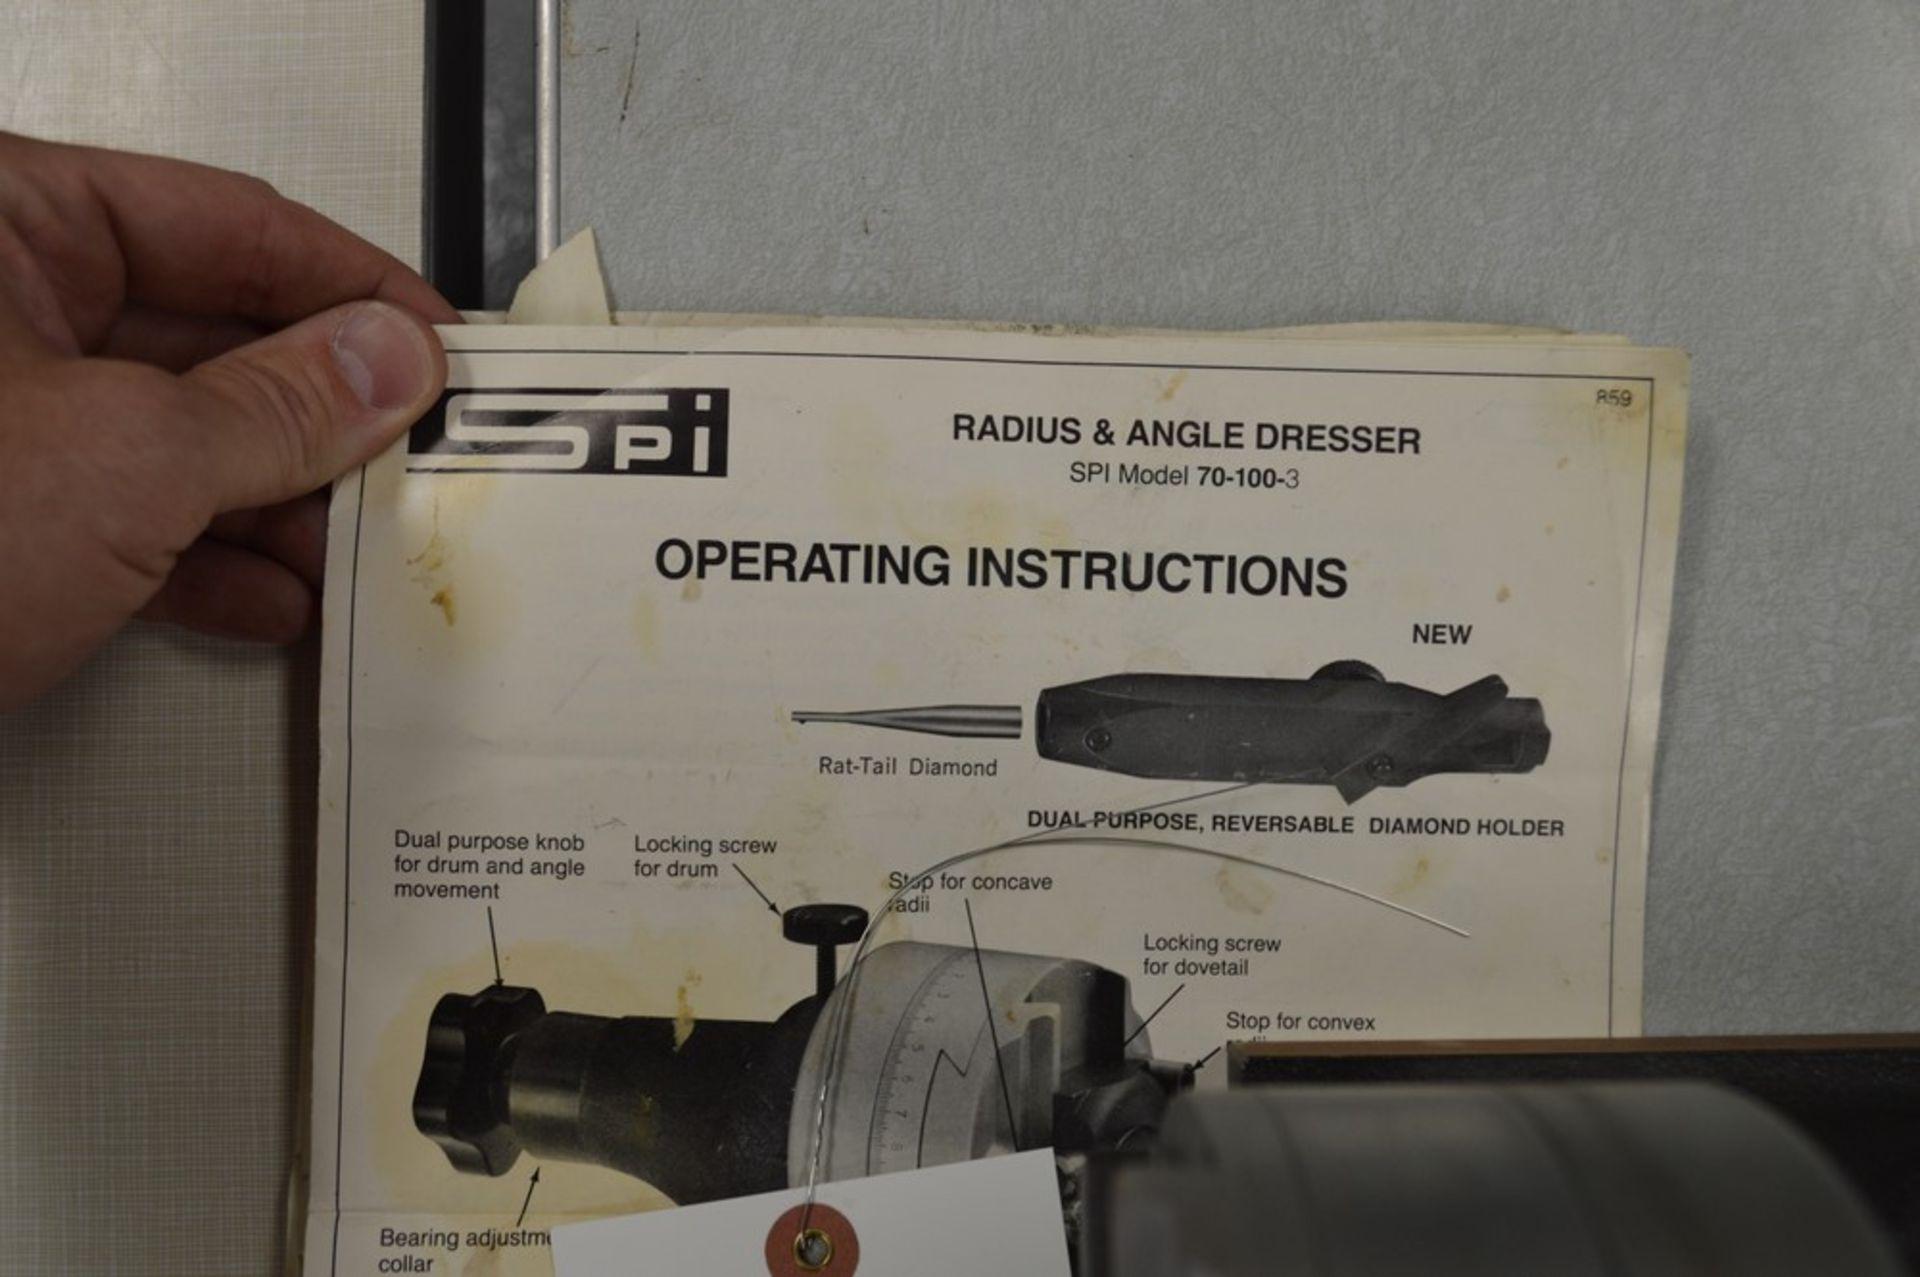 SPI Grinding Wheel Radius and Angle dresser - Image 3 of 3